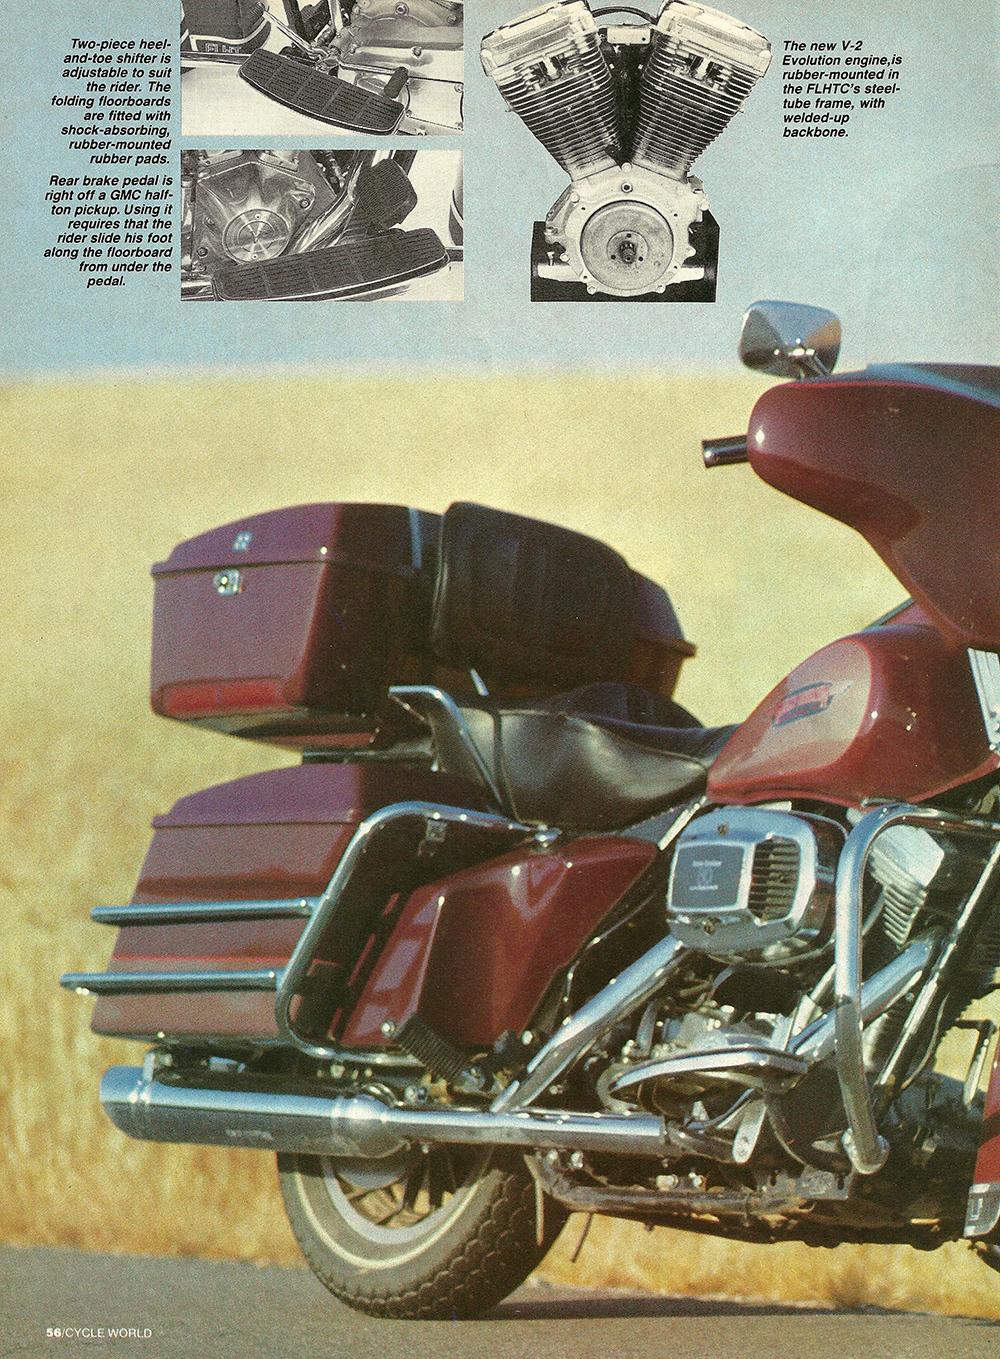 1983 Harley-Davidson FLHTC road test 03.jpg